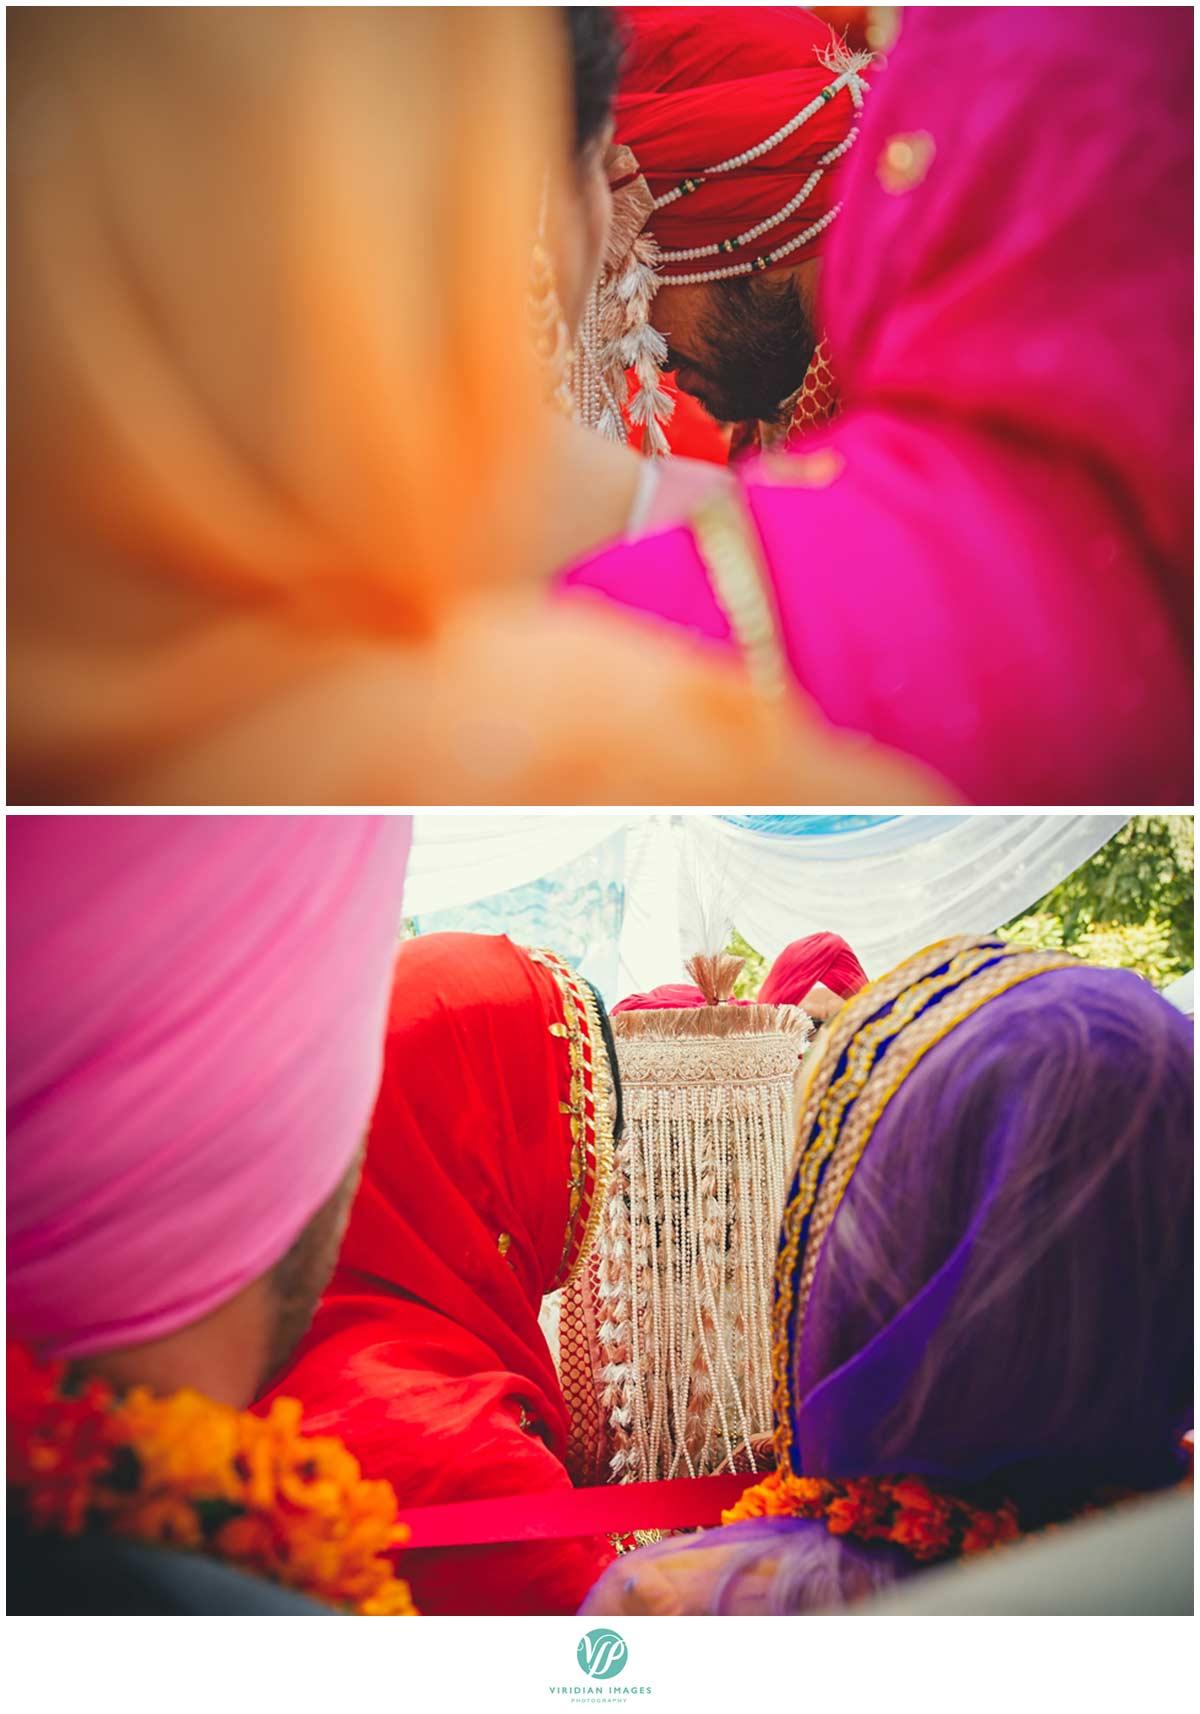 India_Chandigarh_Wedding_Viridian_Images_Photography_poto_16